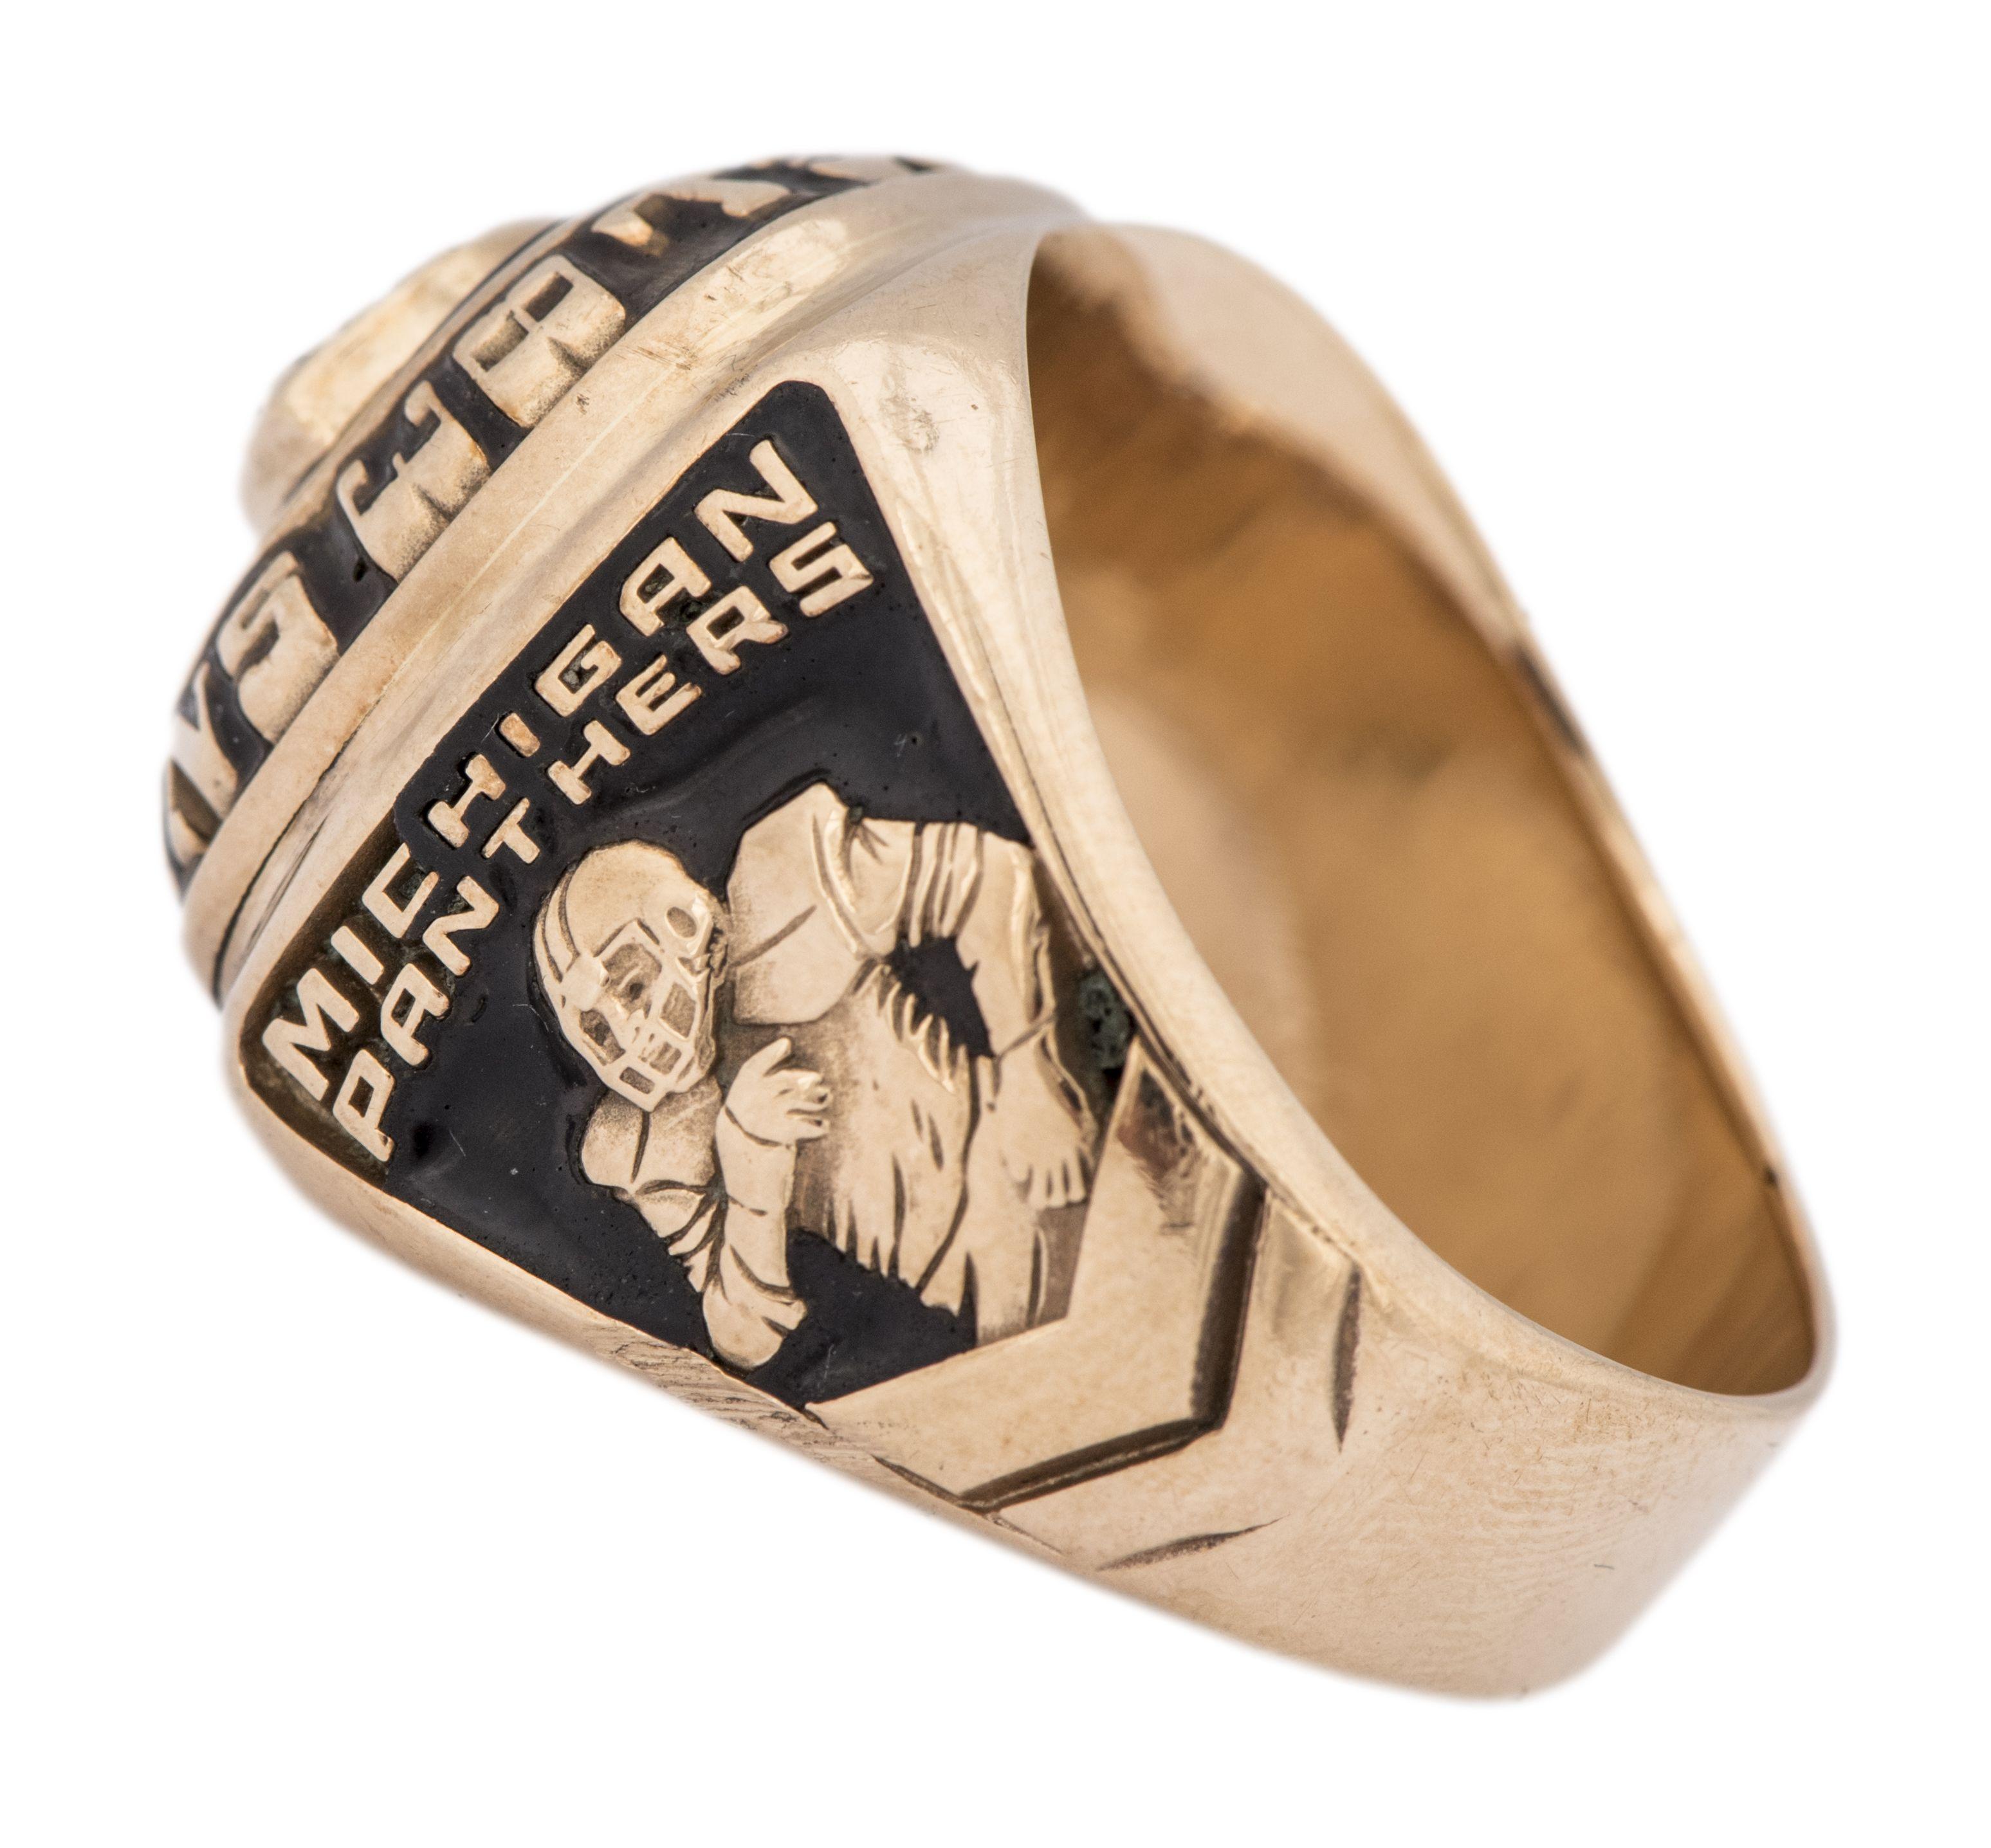 Michigan panthers 1983 usfl championship ring nfl